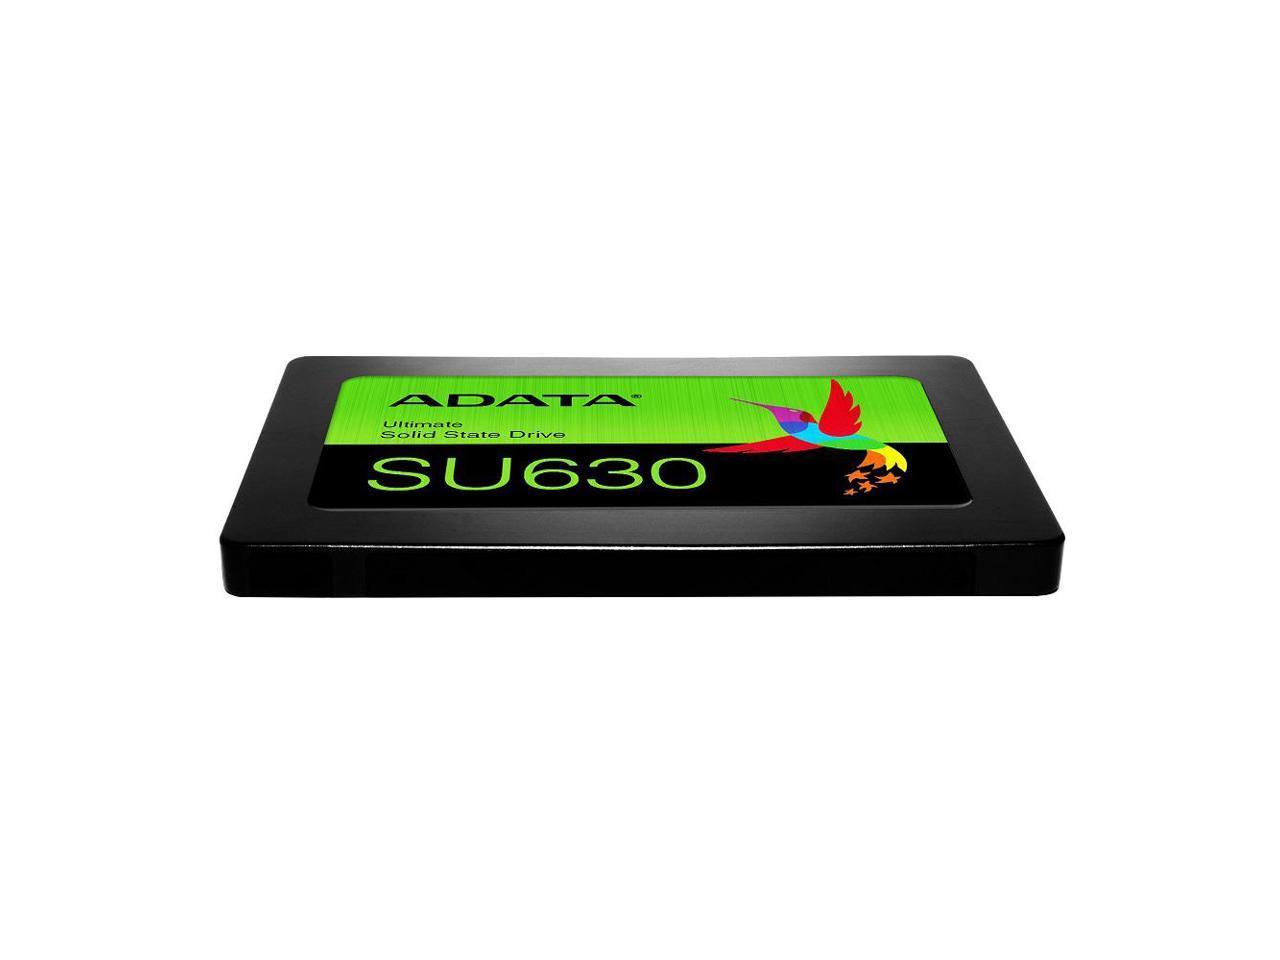 ADATA-Ultimate-Series-SU630-960GB-Internal-SATA-Solid-State-Drive thumbnail 4